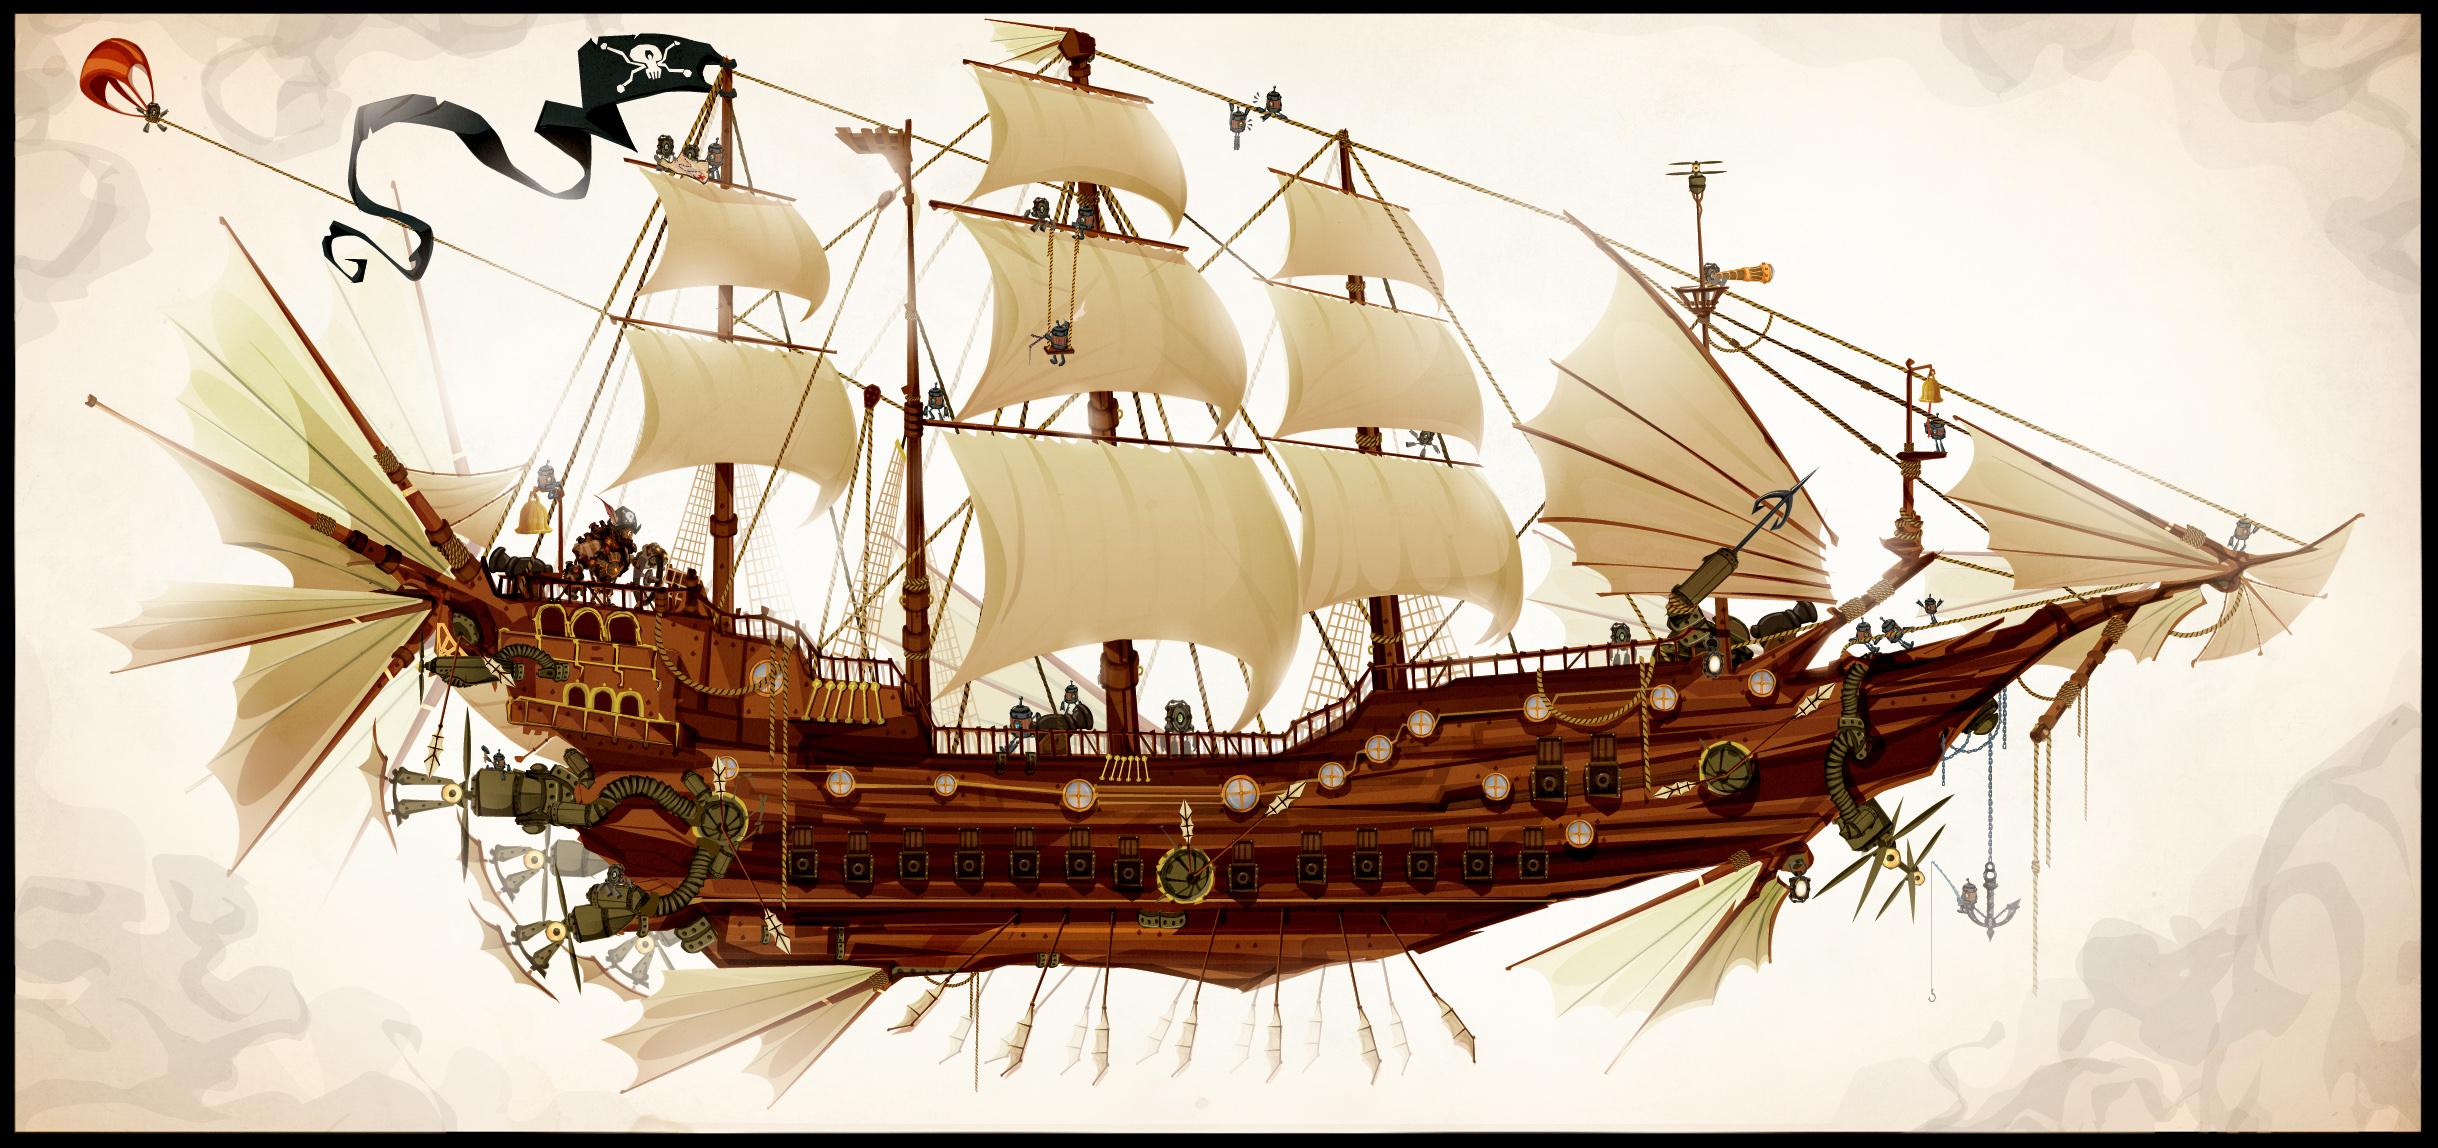 The Clockwork Pirateship